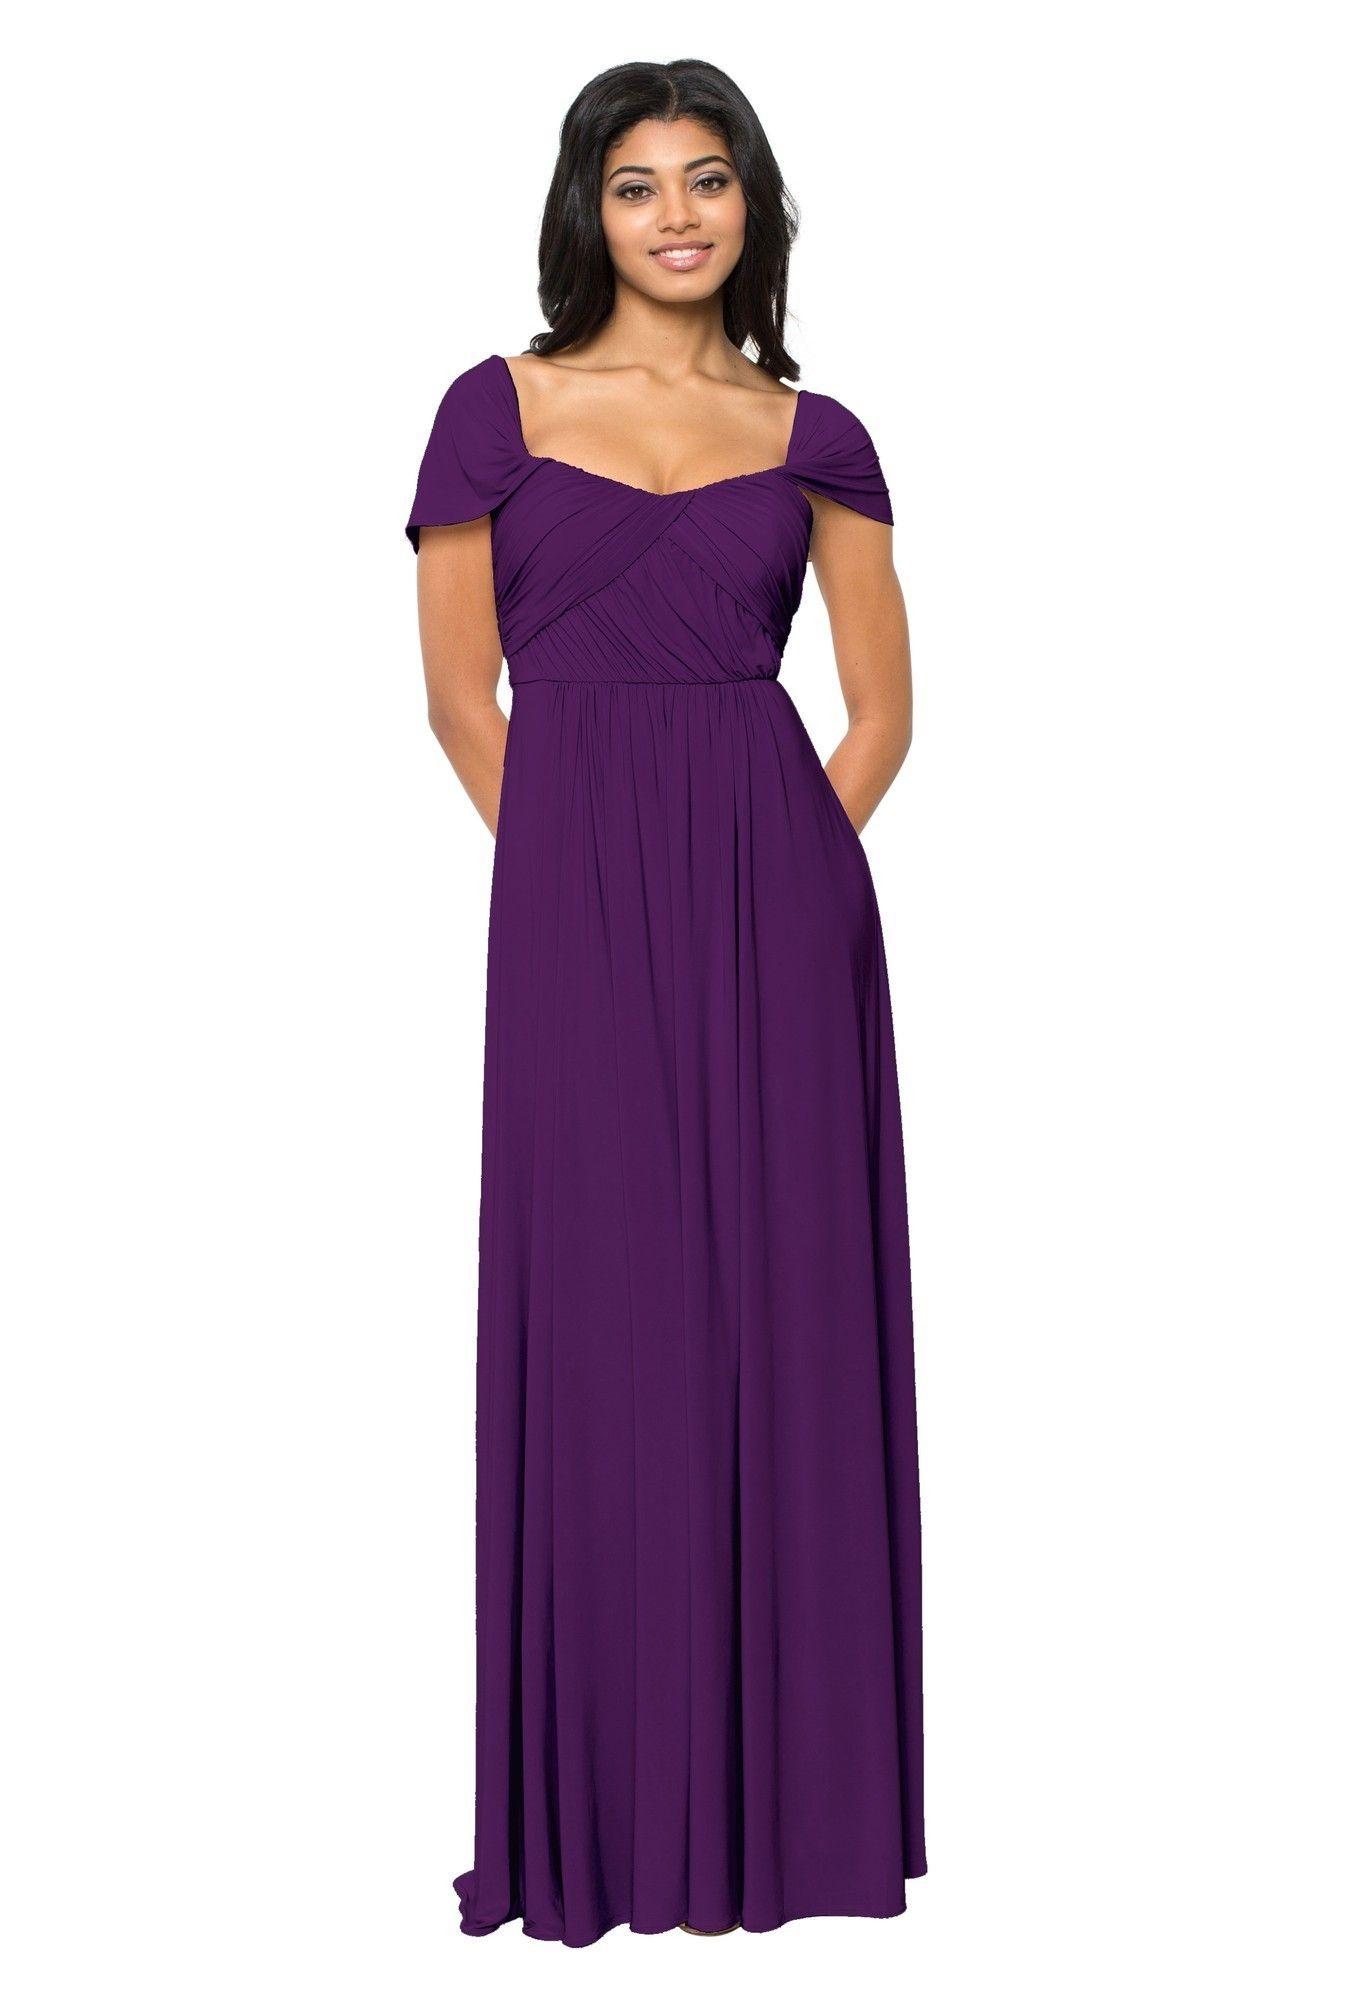 Único Vestido De Novia Jordan Modelo - Vestido de Novia Para Las ...